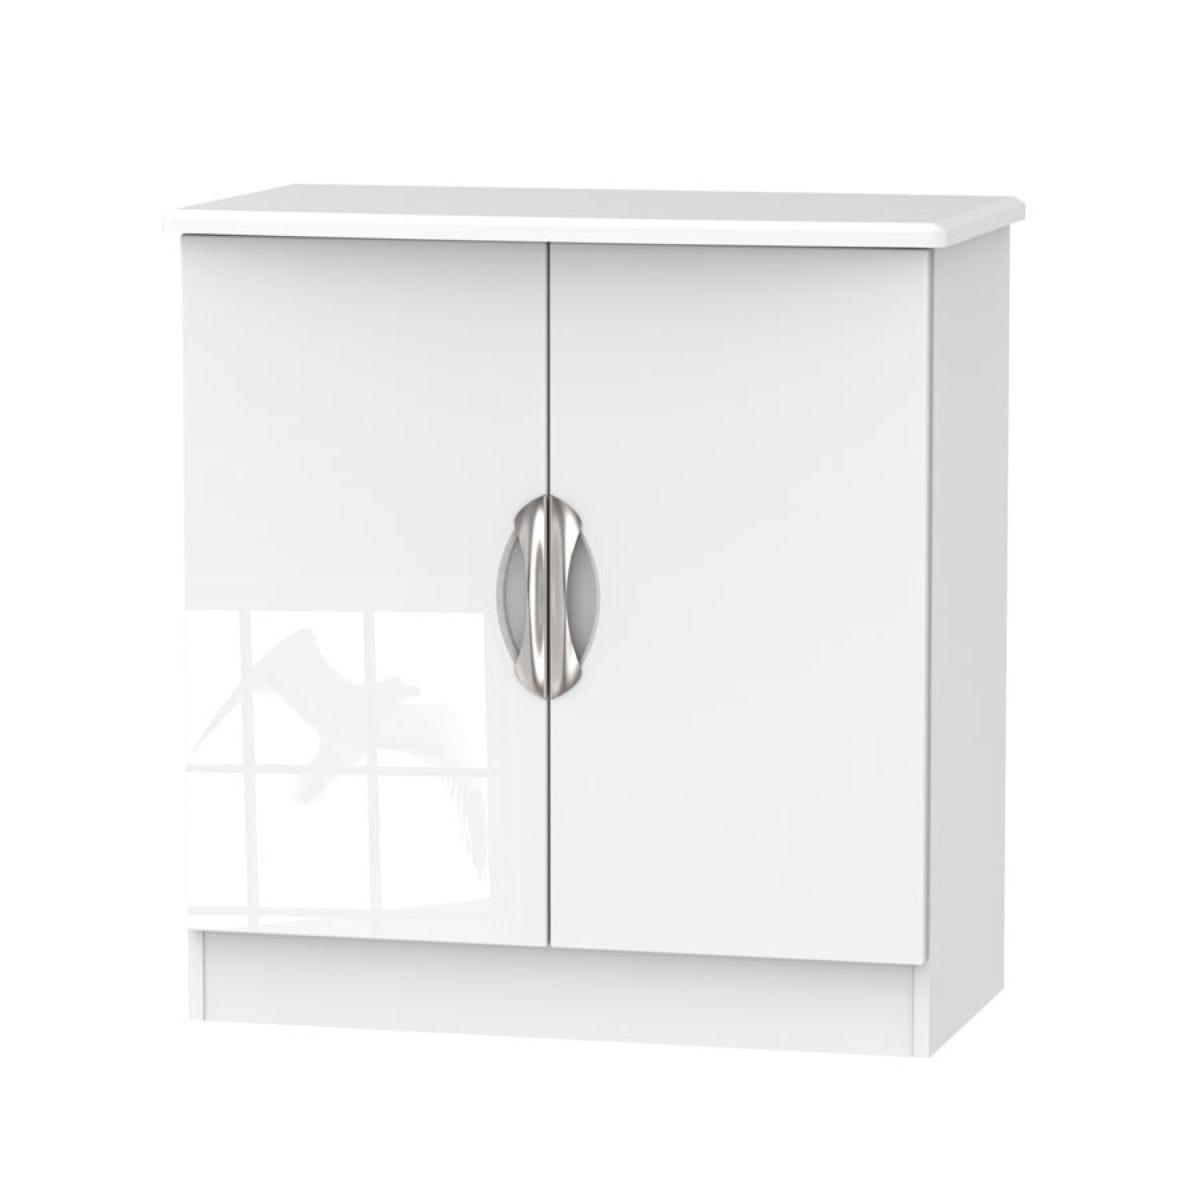 Indices Double Door Sideboard - White